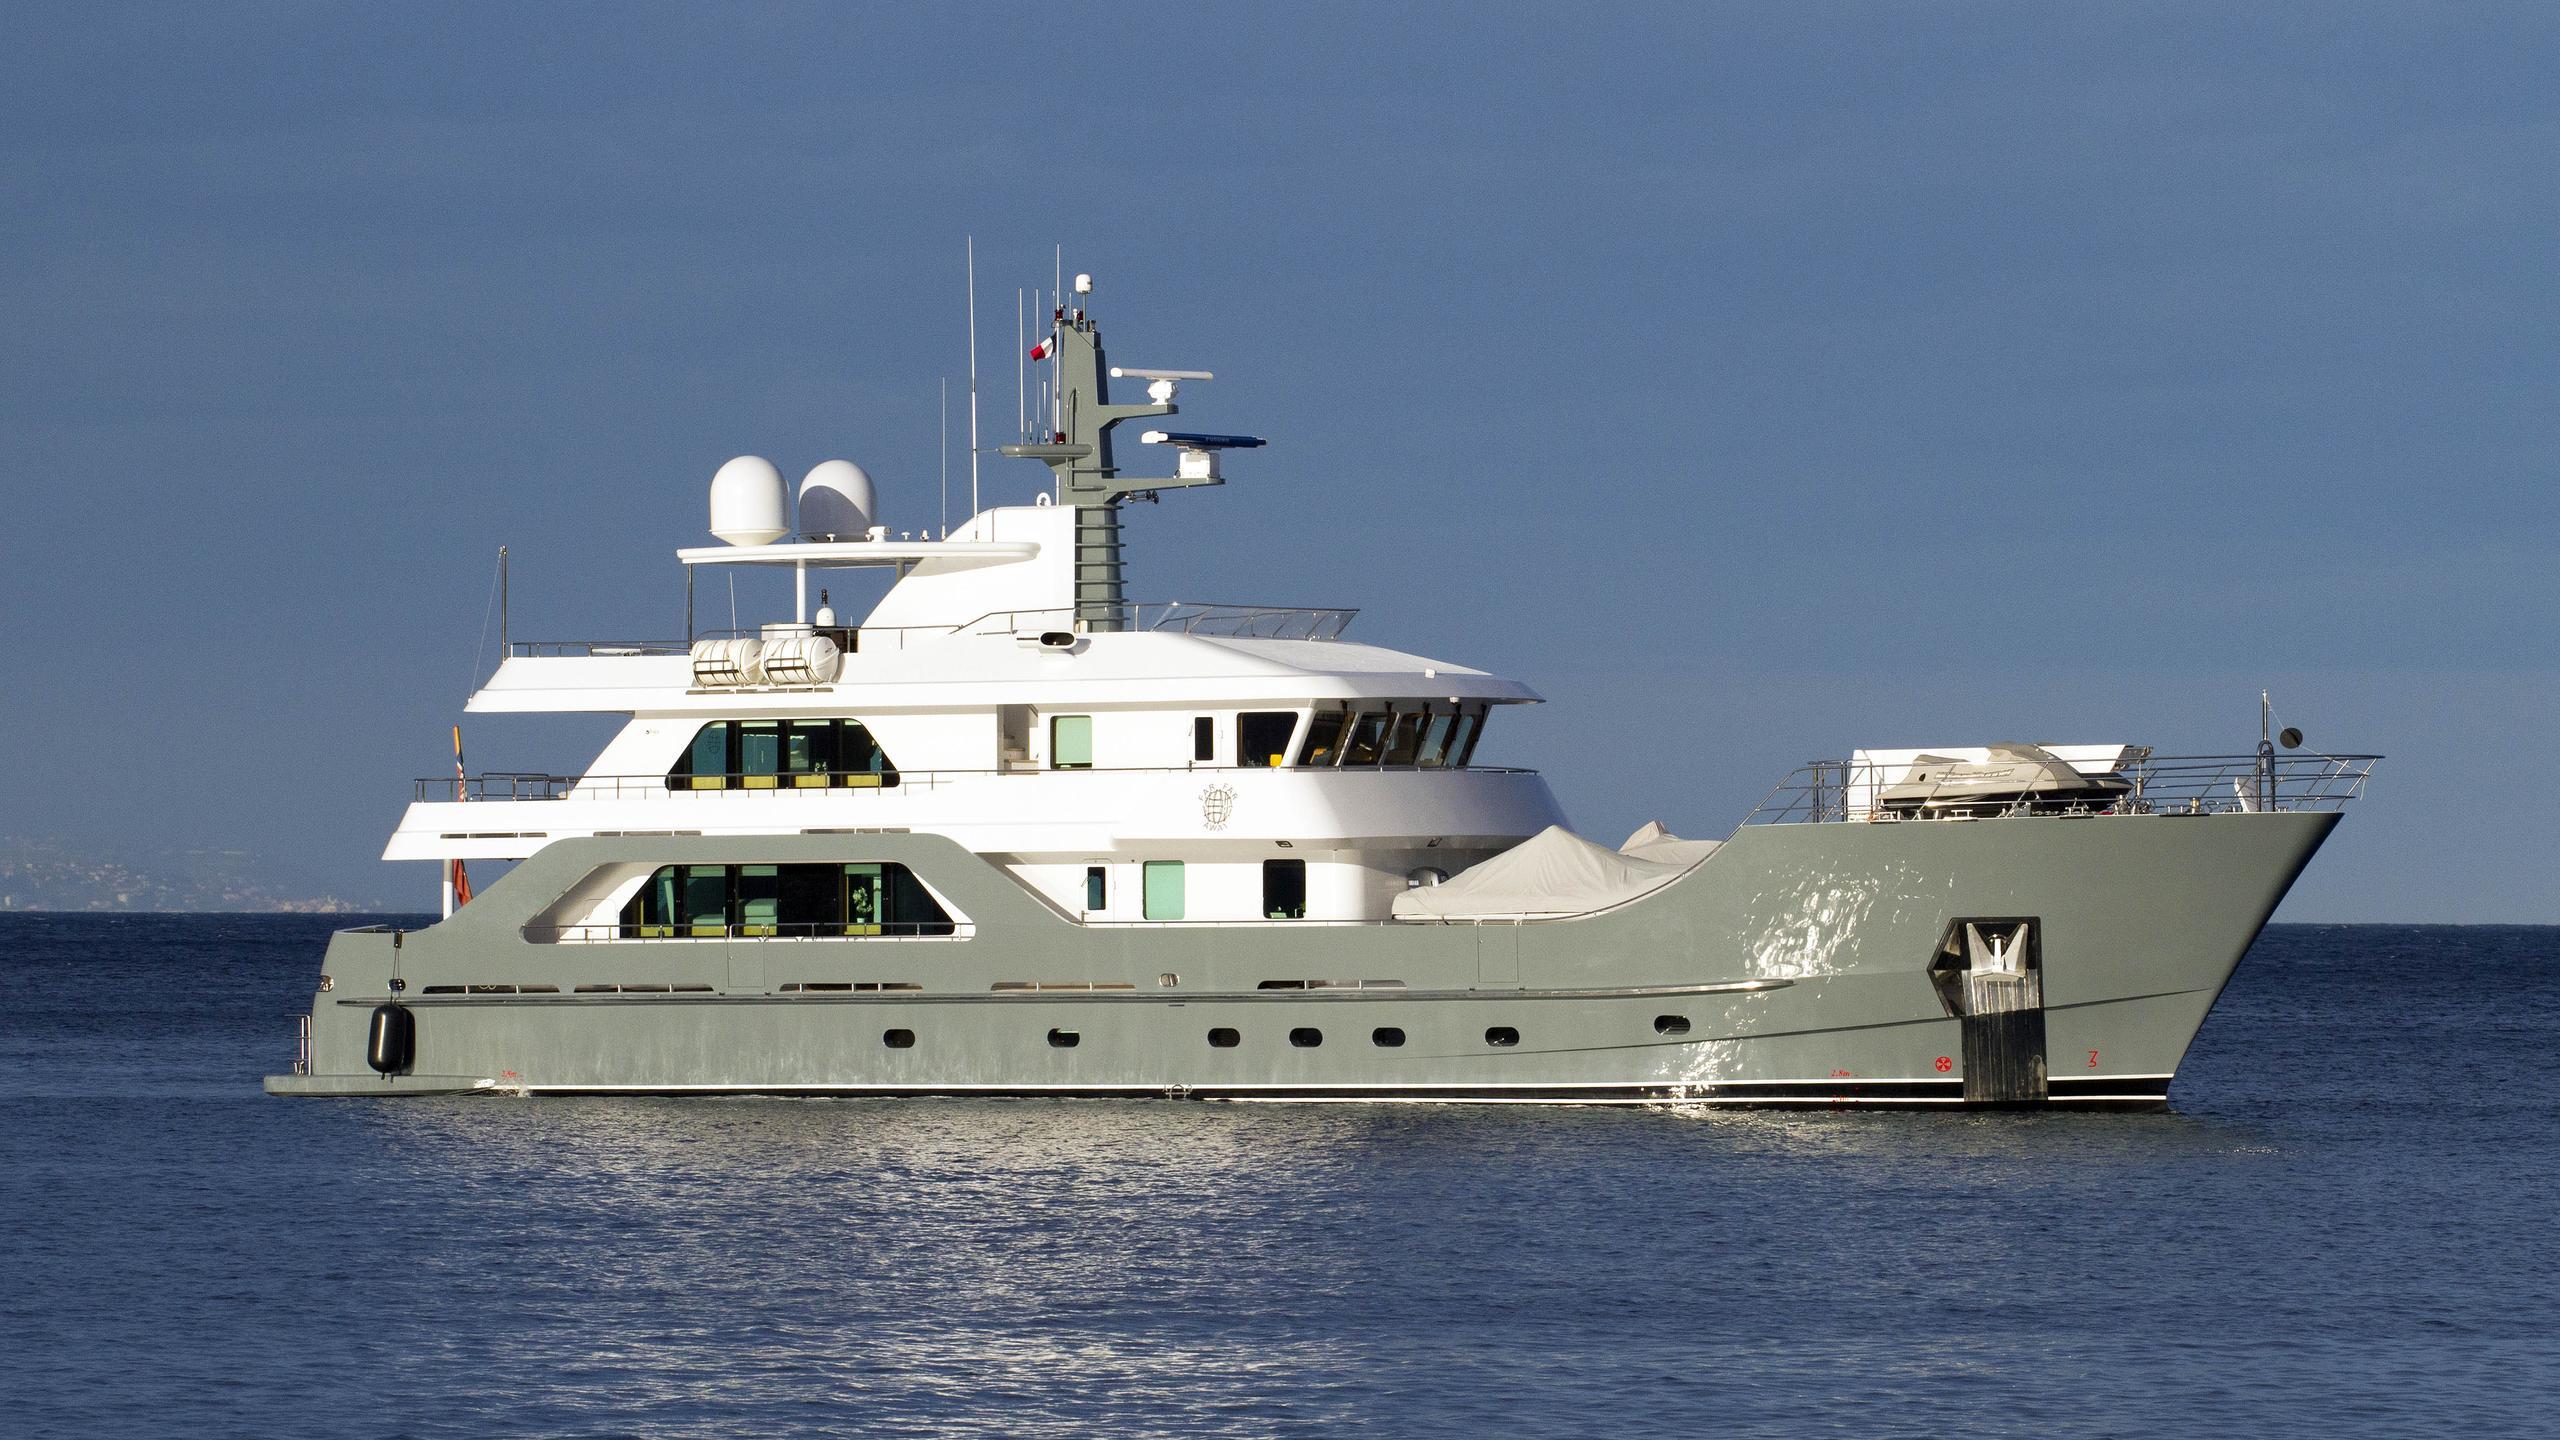 far-far-away-motor-yacht-inace-explorer-120-2012-37m-profile